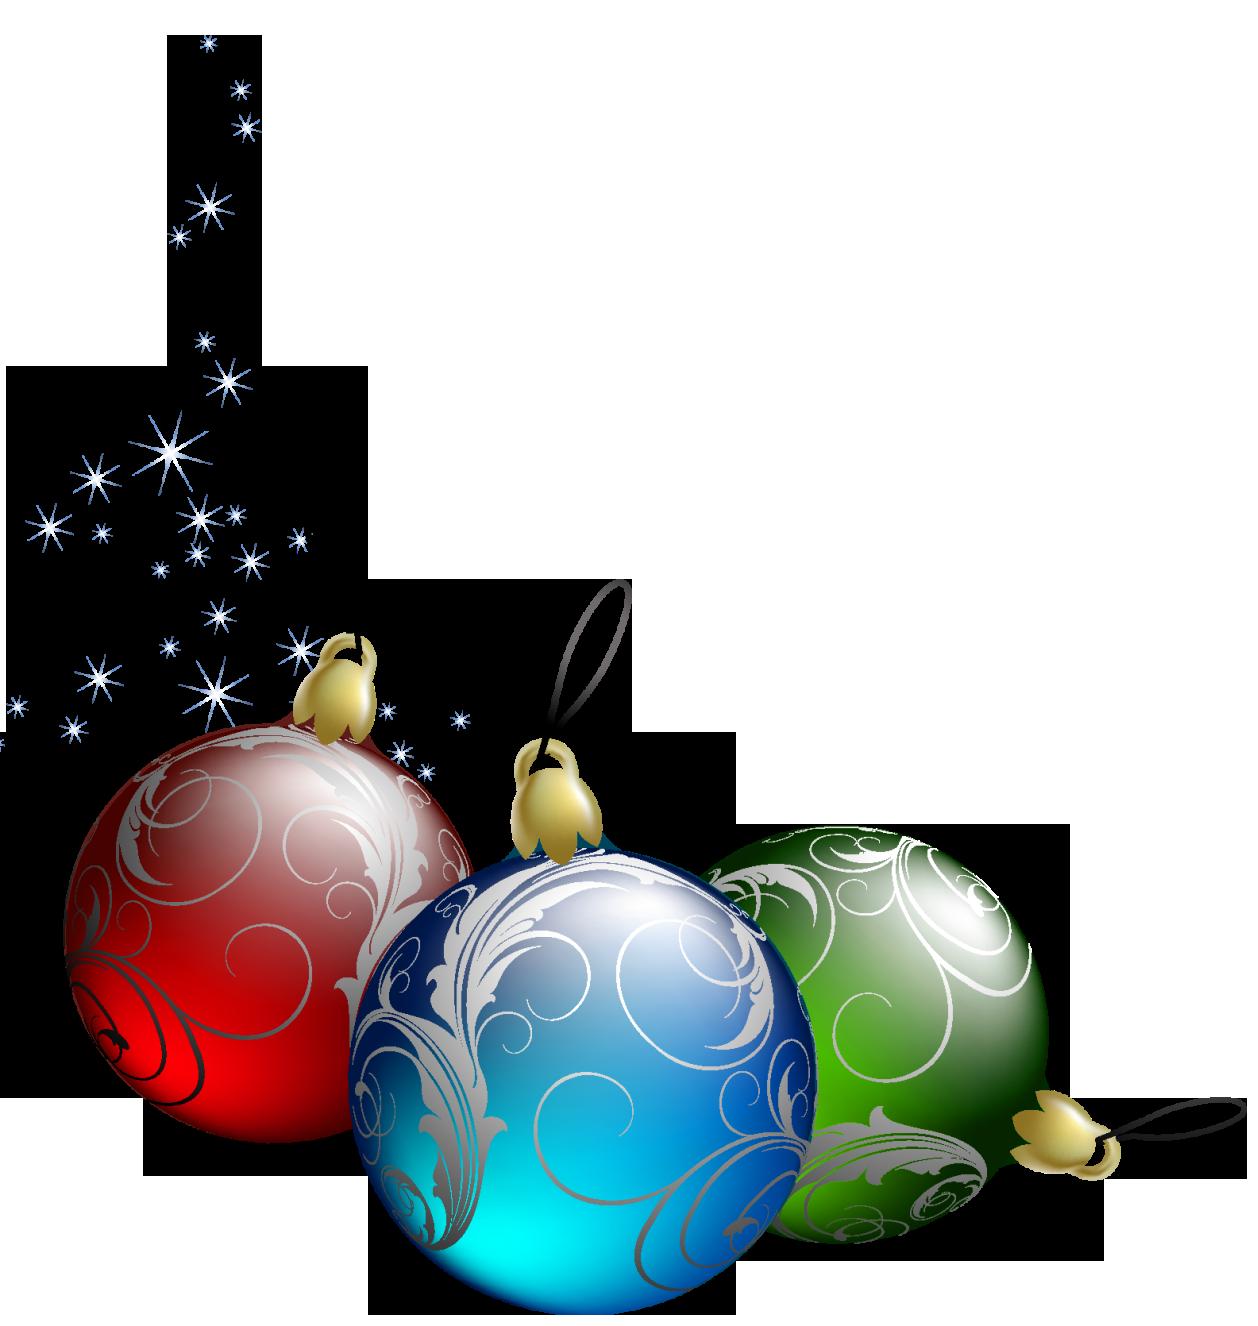 Tree Christmas Transparent .-Tree Christmas Transparent .-13